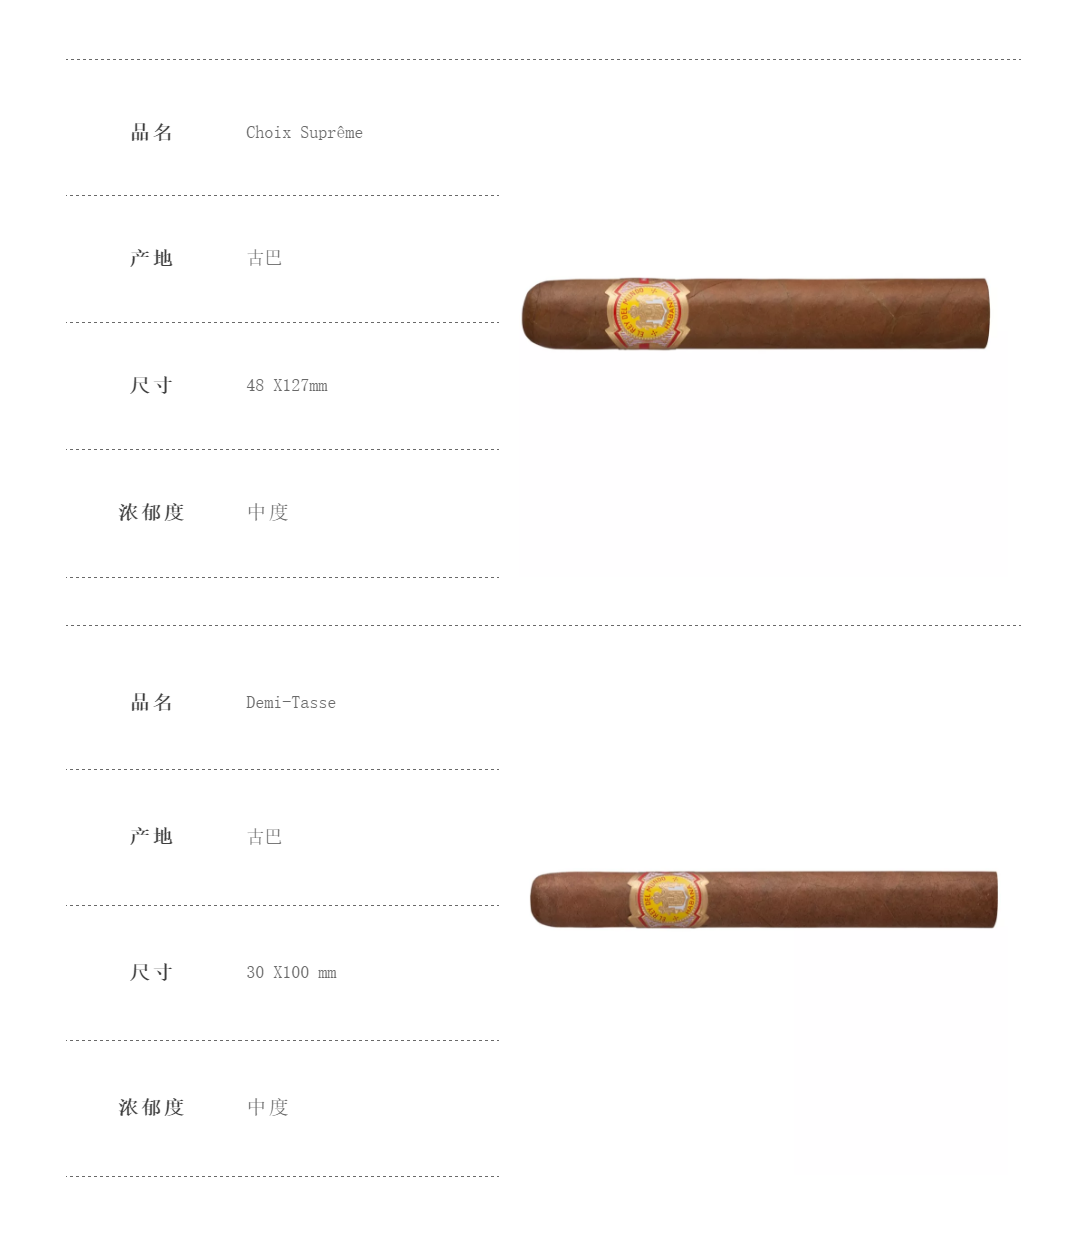 雪茄.png